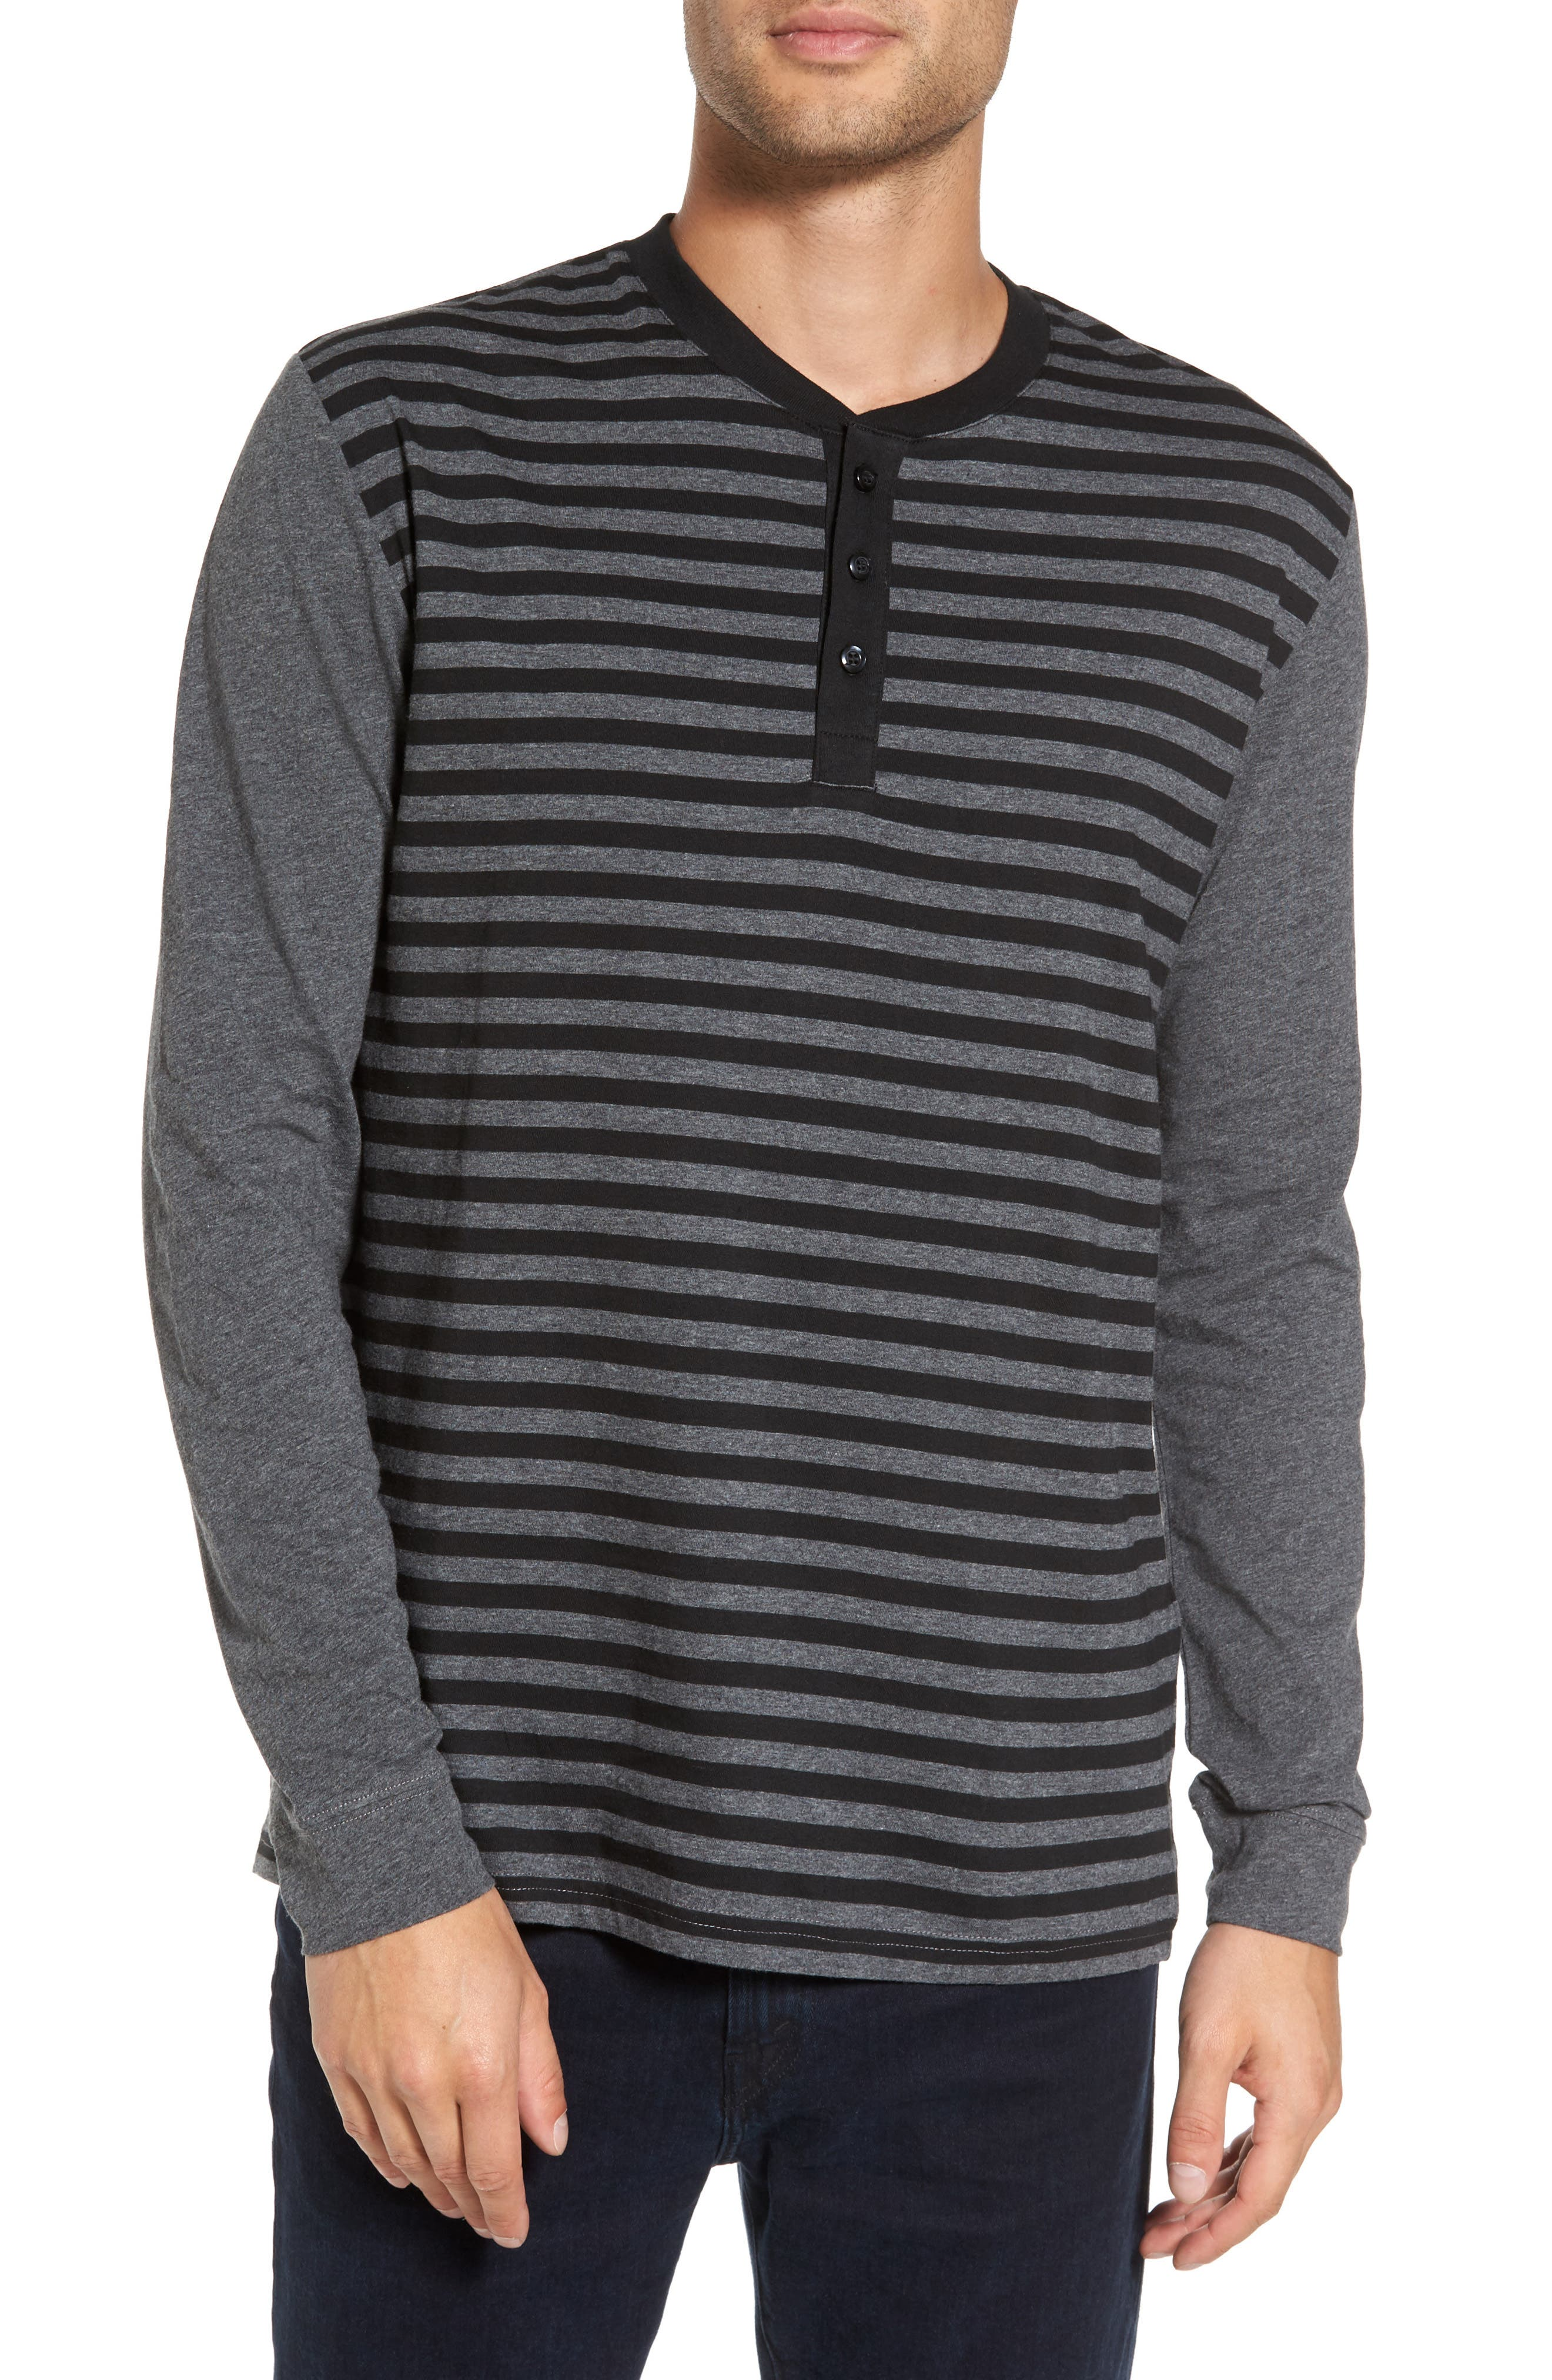 Alternate Image 1 Selected - Slate & Stone Striped Long Sleeve Henley T-Shirt